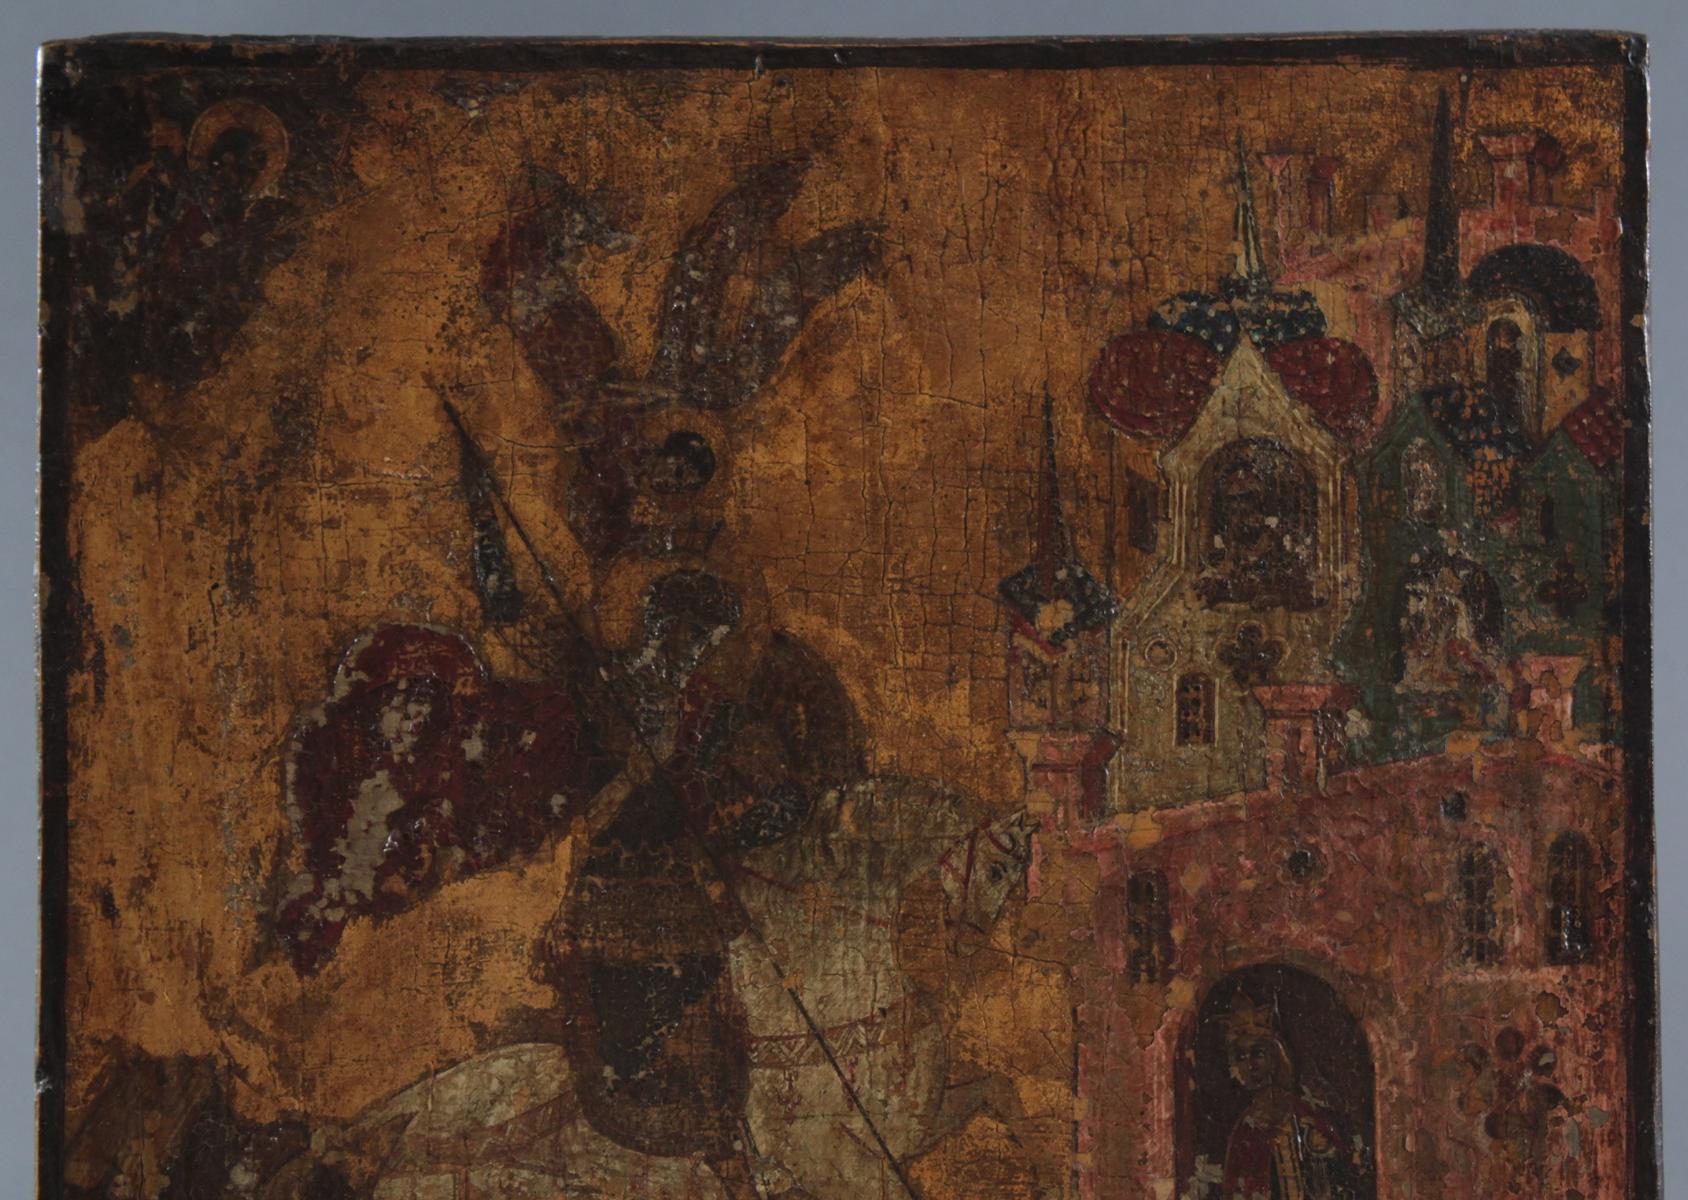 Ikone 'Heiliger Georg der Drachentöter', Russland 18. Jh.-2